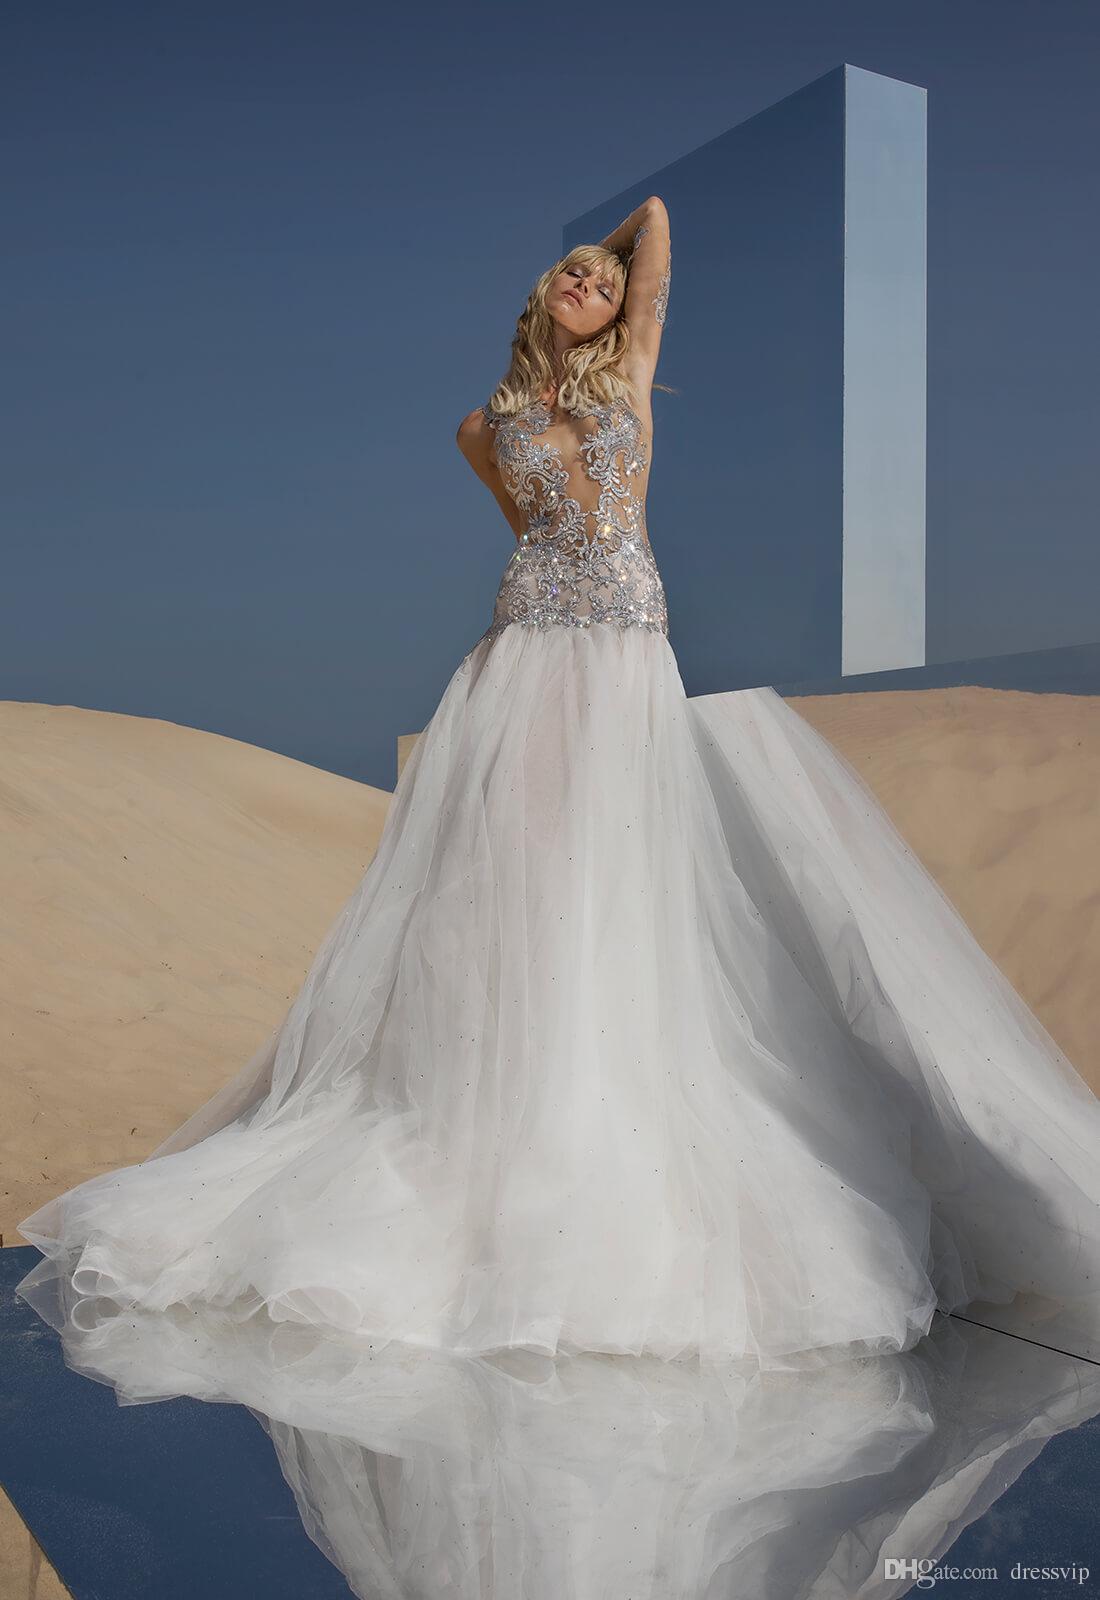 2018 Pnina Tornai Mermaid Wedding Dresses Illusion Tulle Bling Beaded Sequin Sweep Train Long Sleeve Bridal Dress Backless Boho Wedding Gown